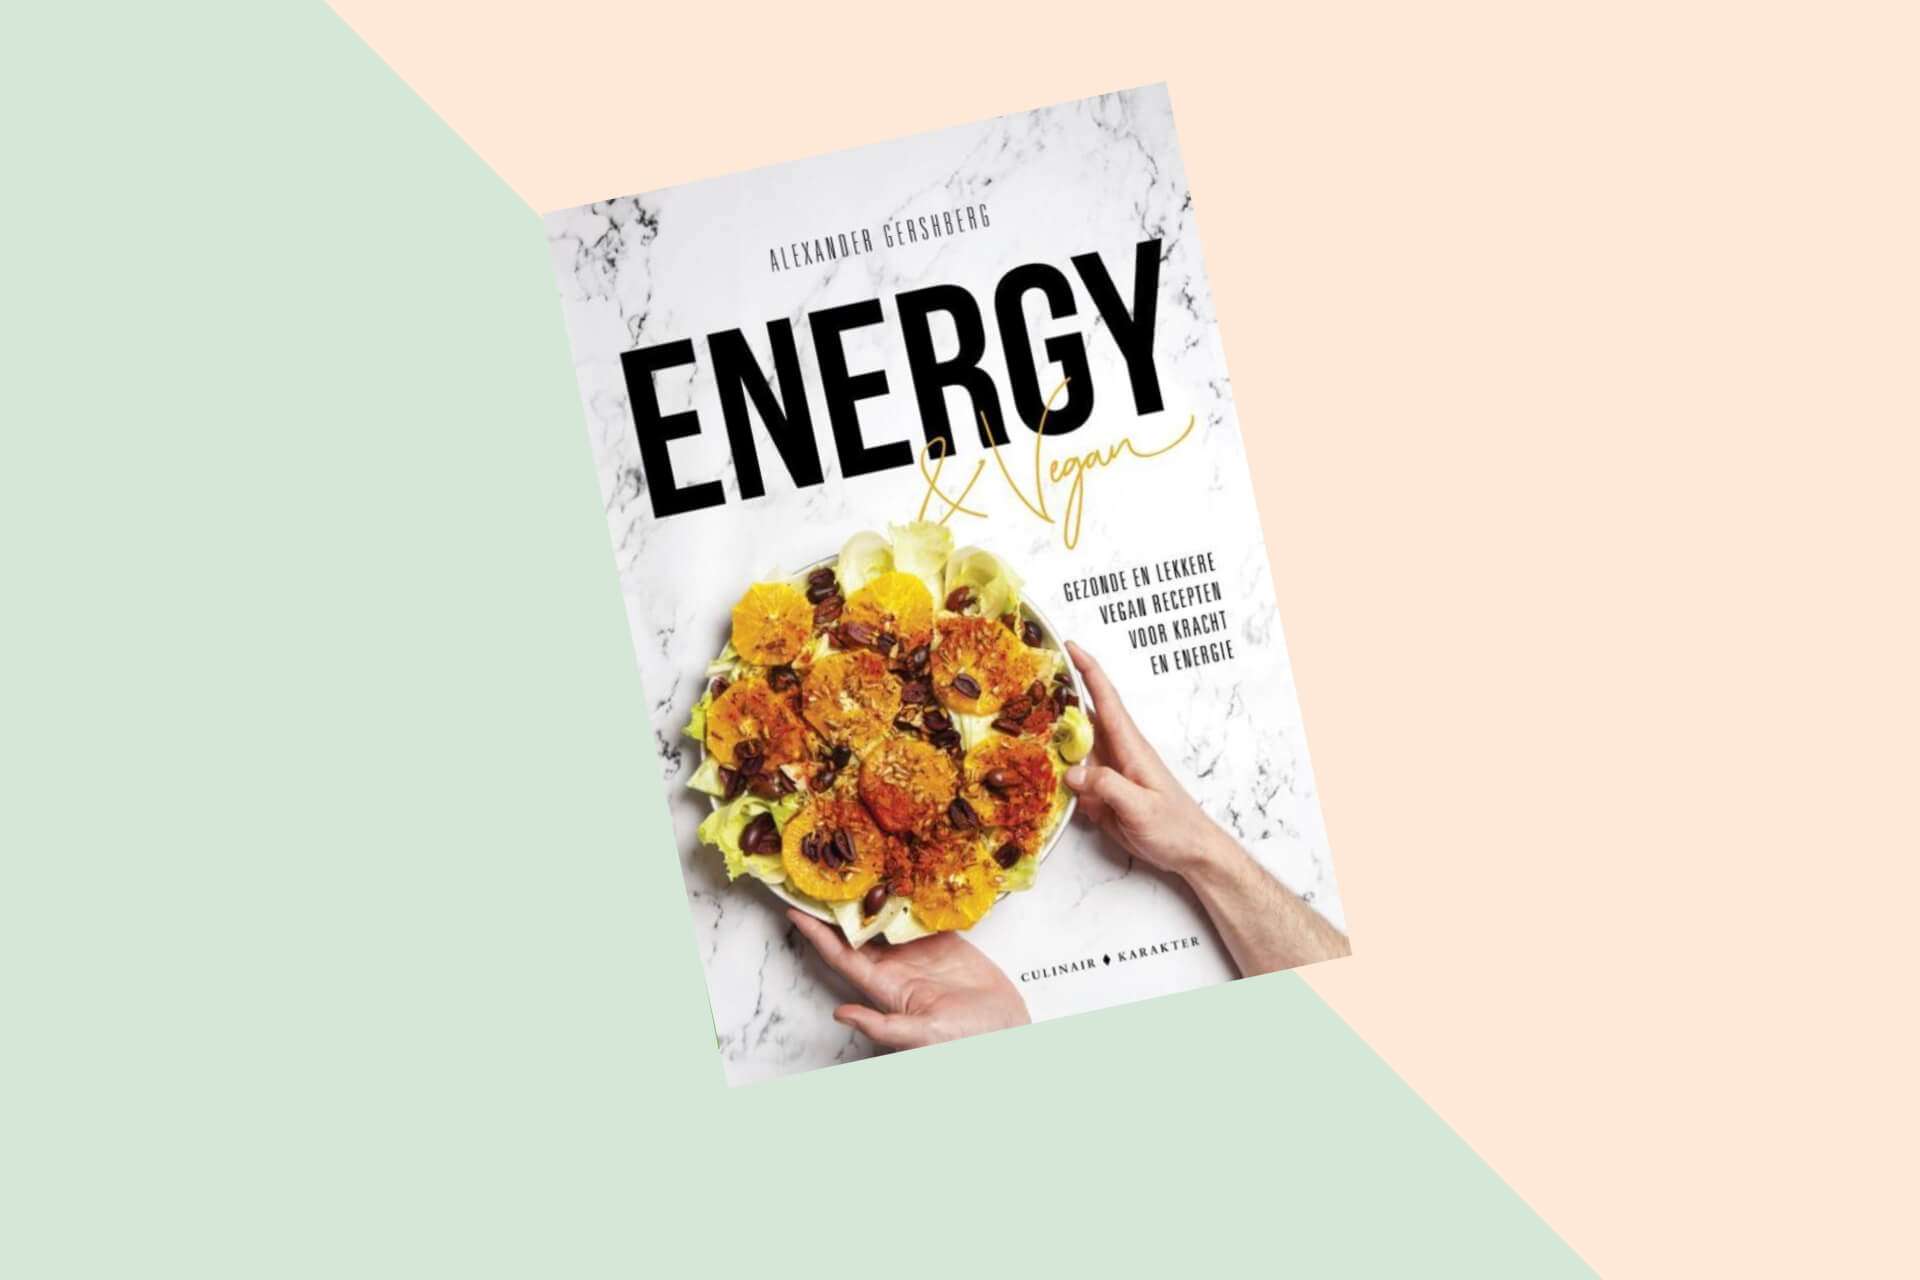 Kookboek: Energy & Vegan van Alexander Gershberg